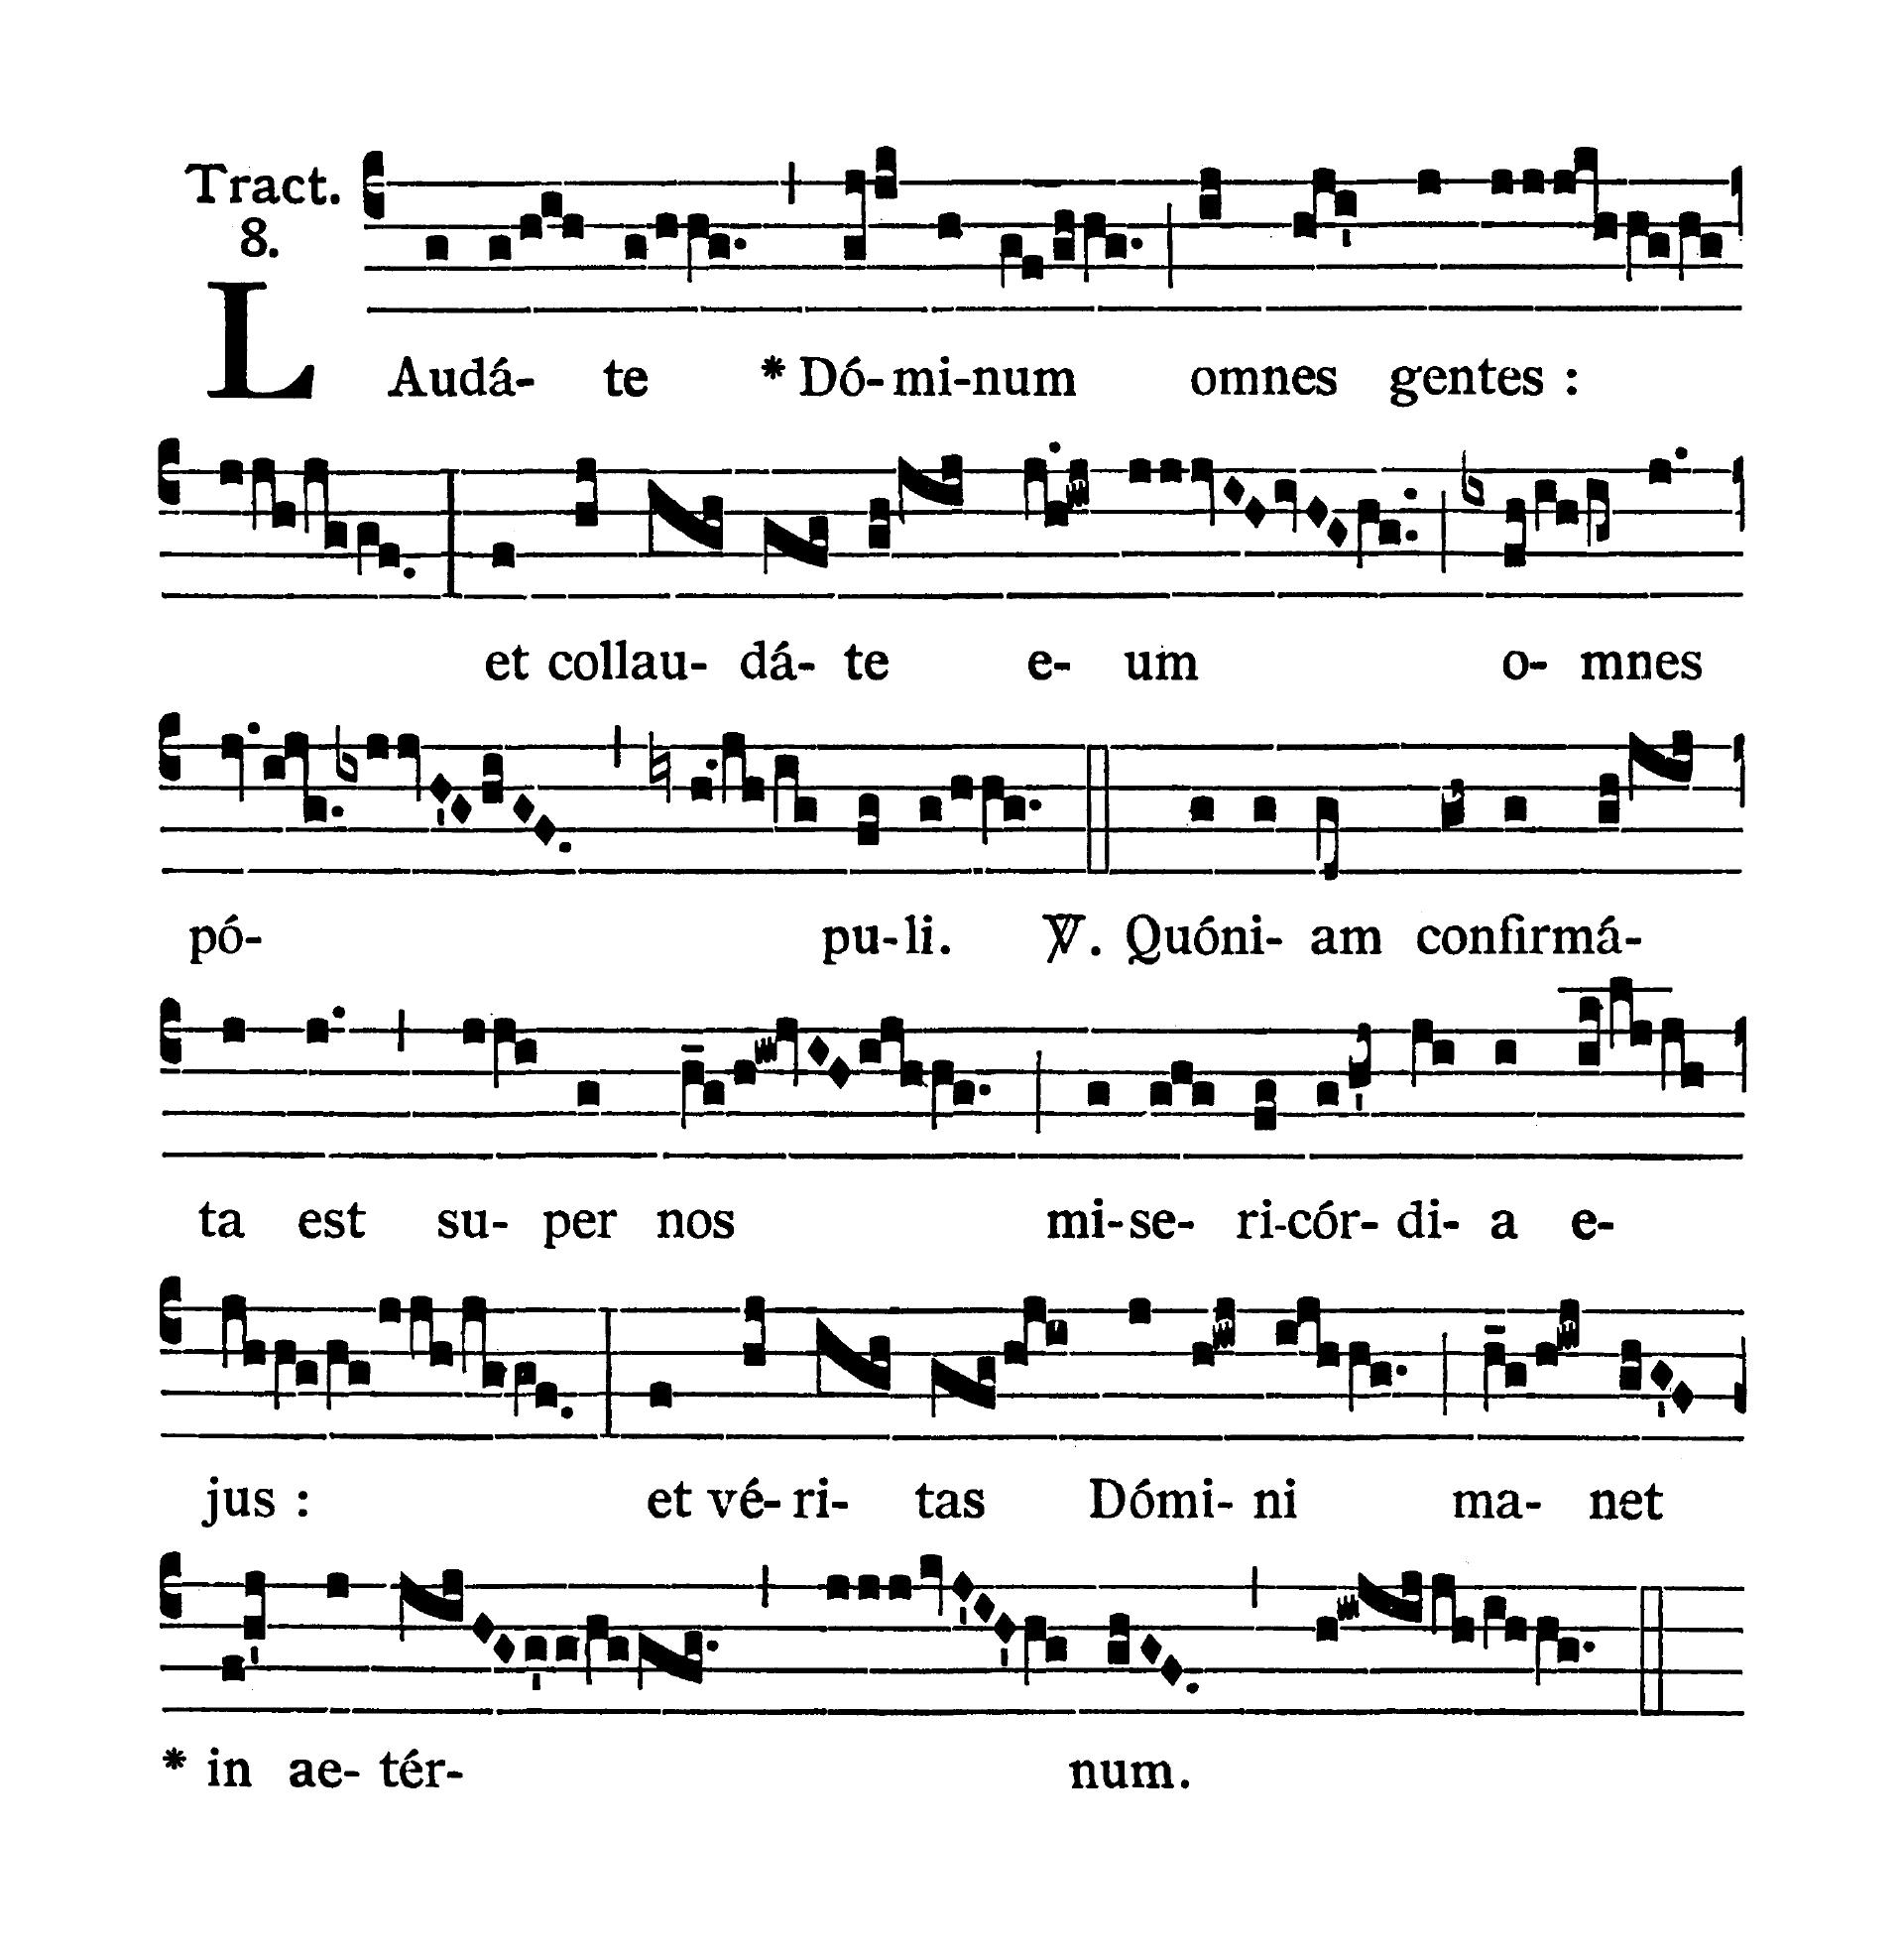 Sabbato infra Octavam Pentecostes (Sobota w oktawie Zesłania Ducha Świętego) - Tractus (Laudate Dominum)